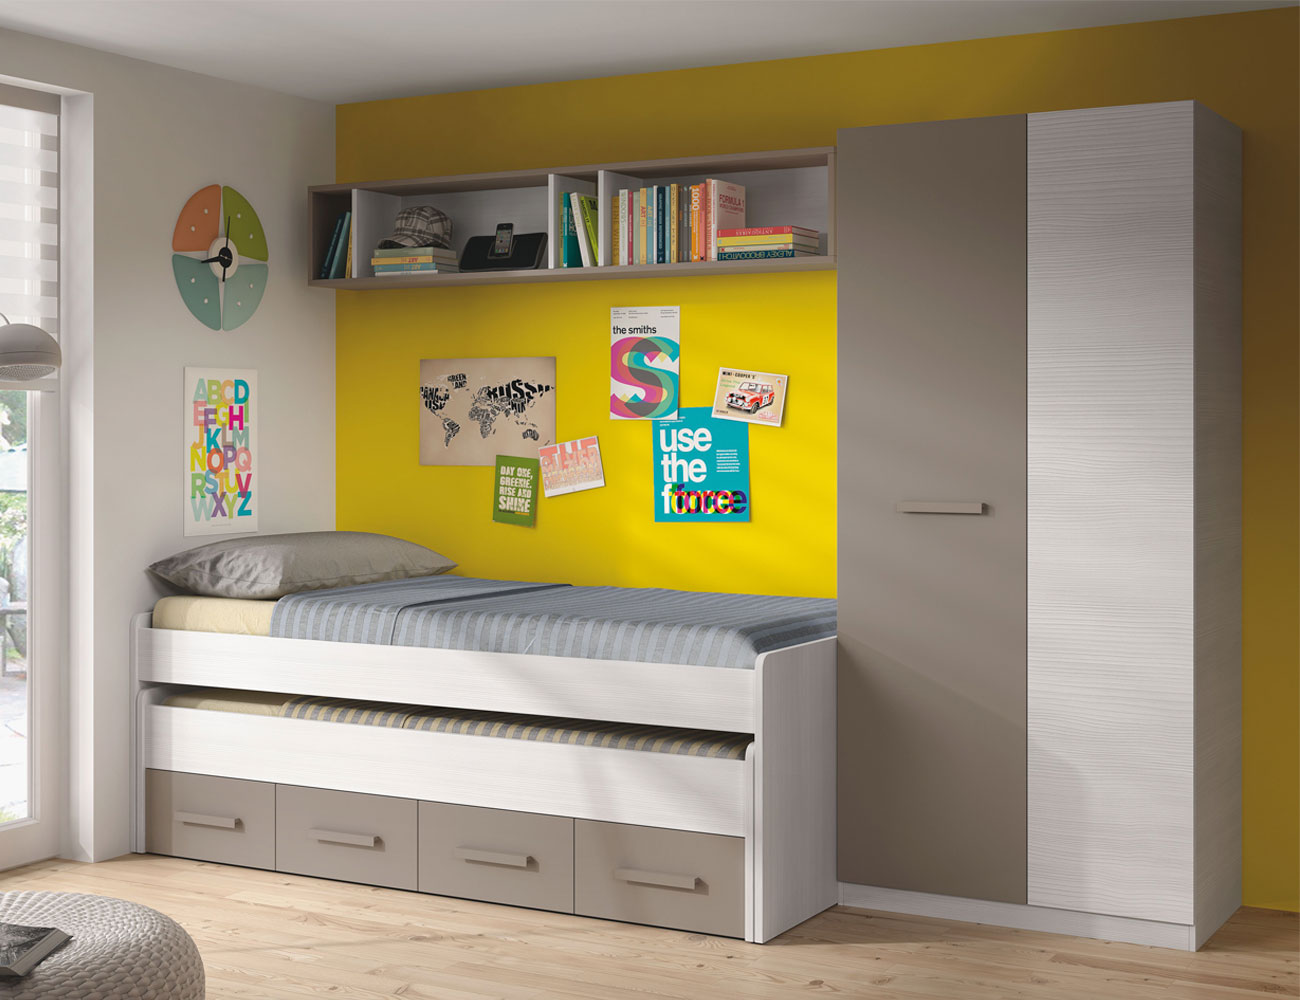 Dormitorio juvenil cama nido armario basalto